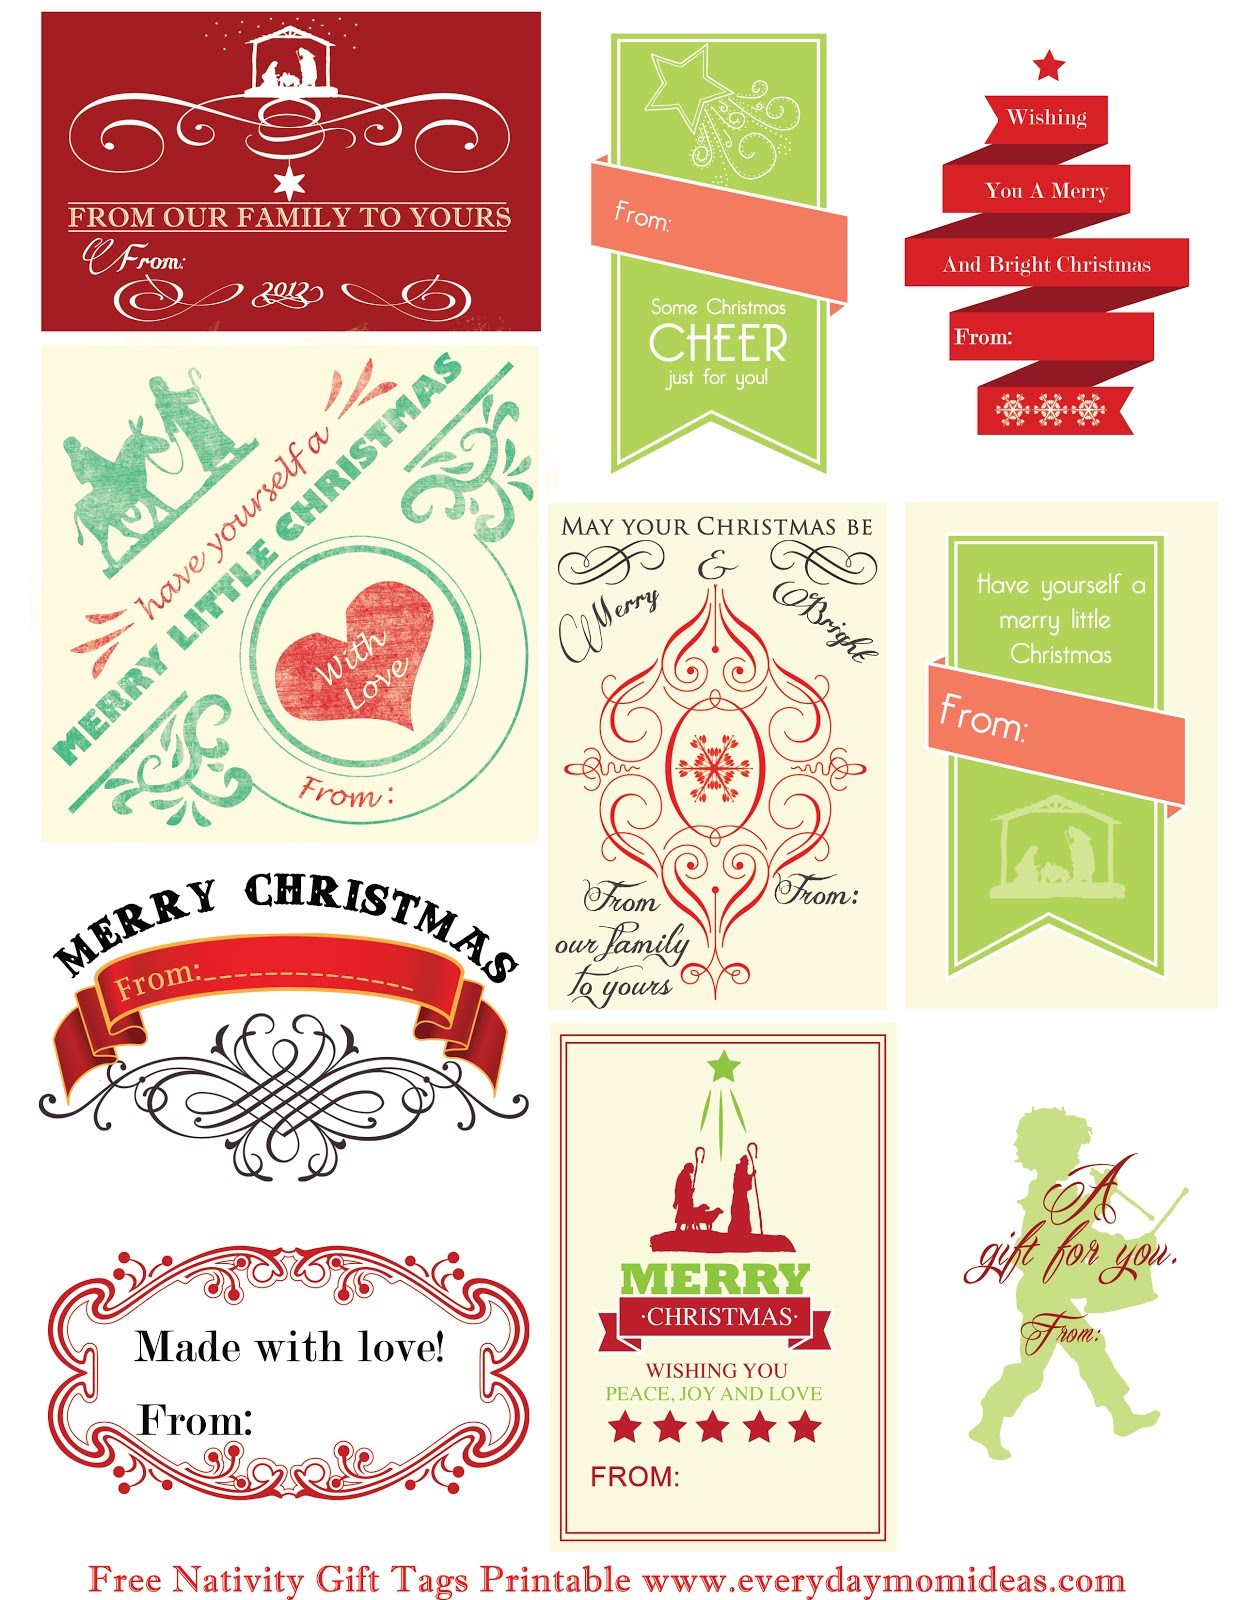 Free Nativity T Tags Printable